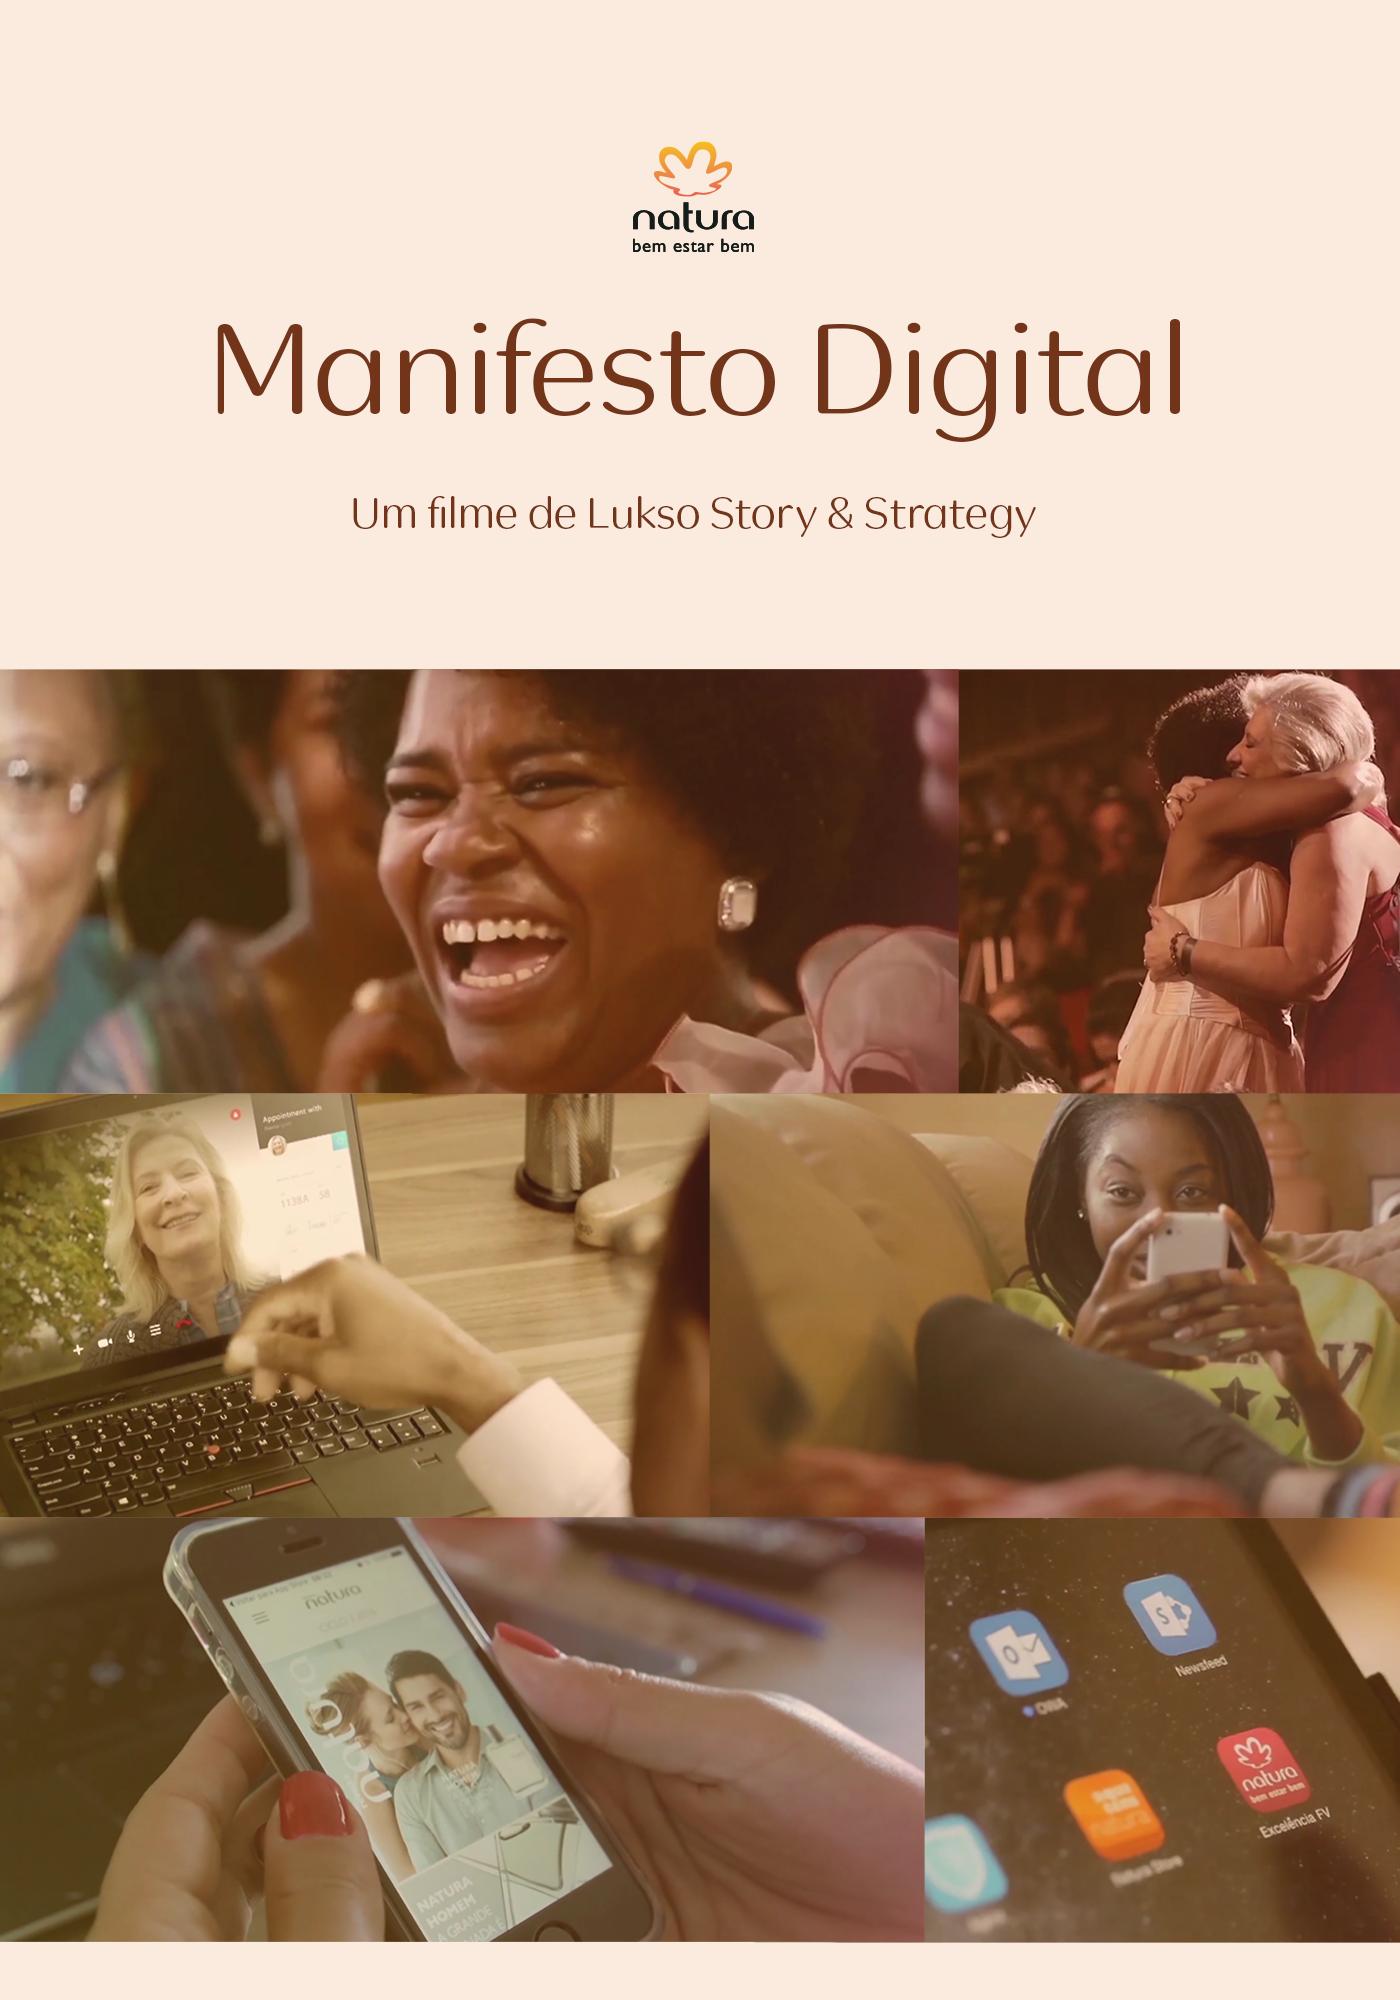 Natura - Manifesto Digital